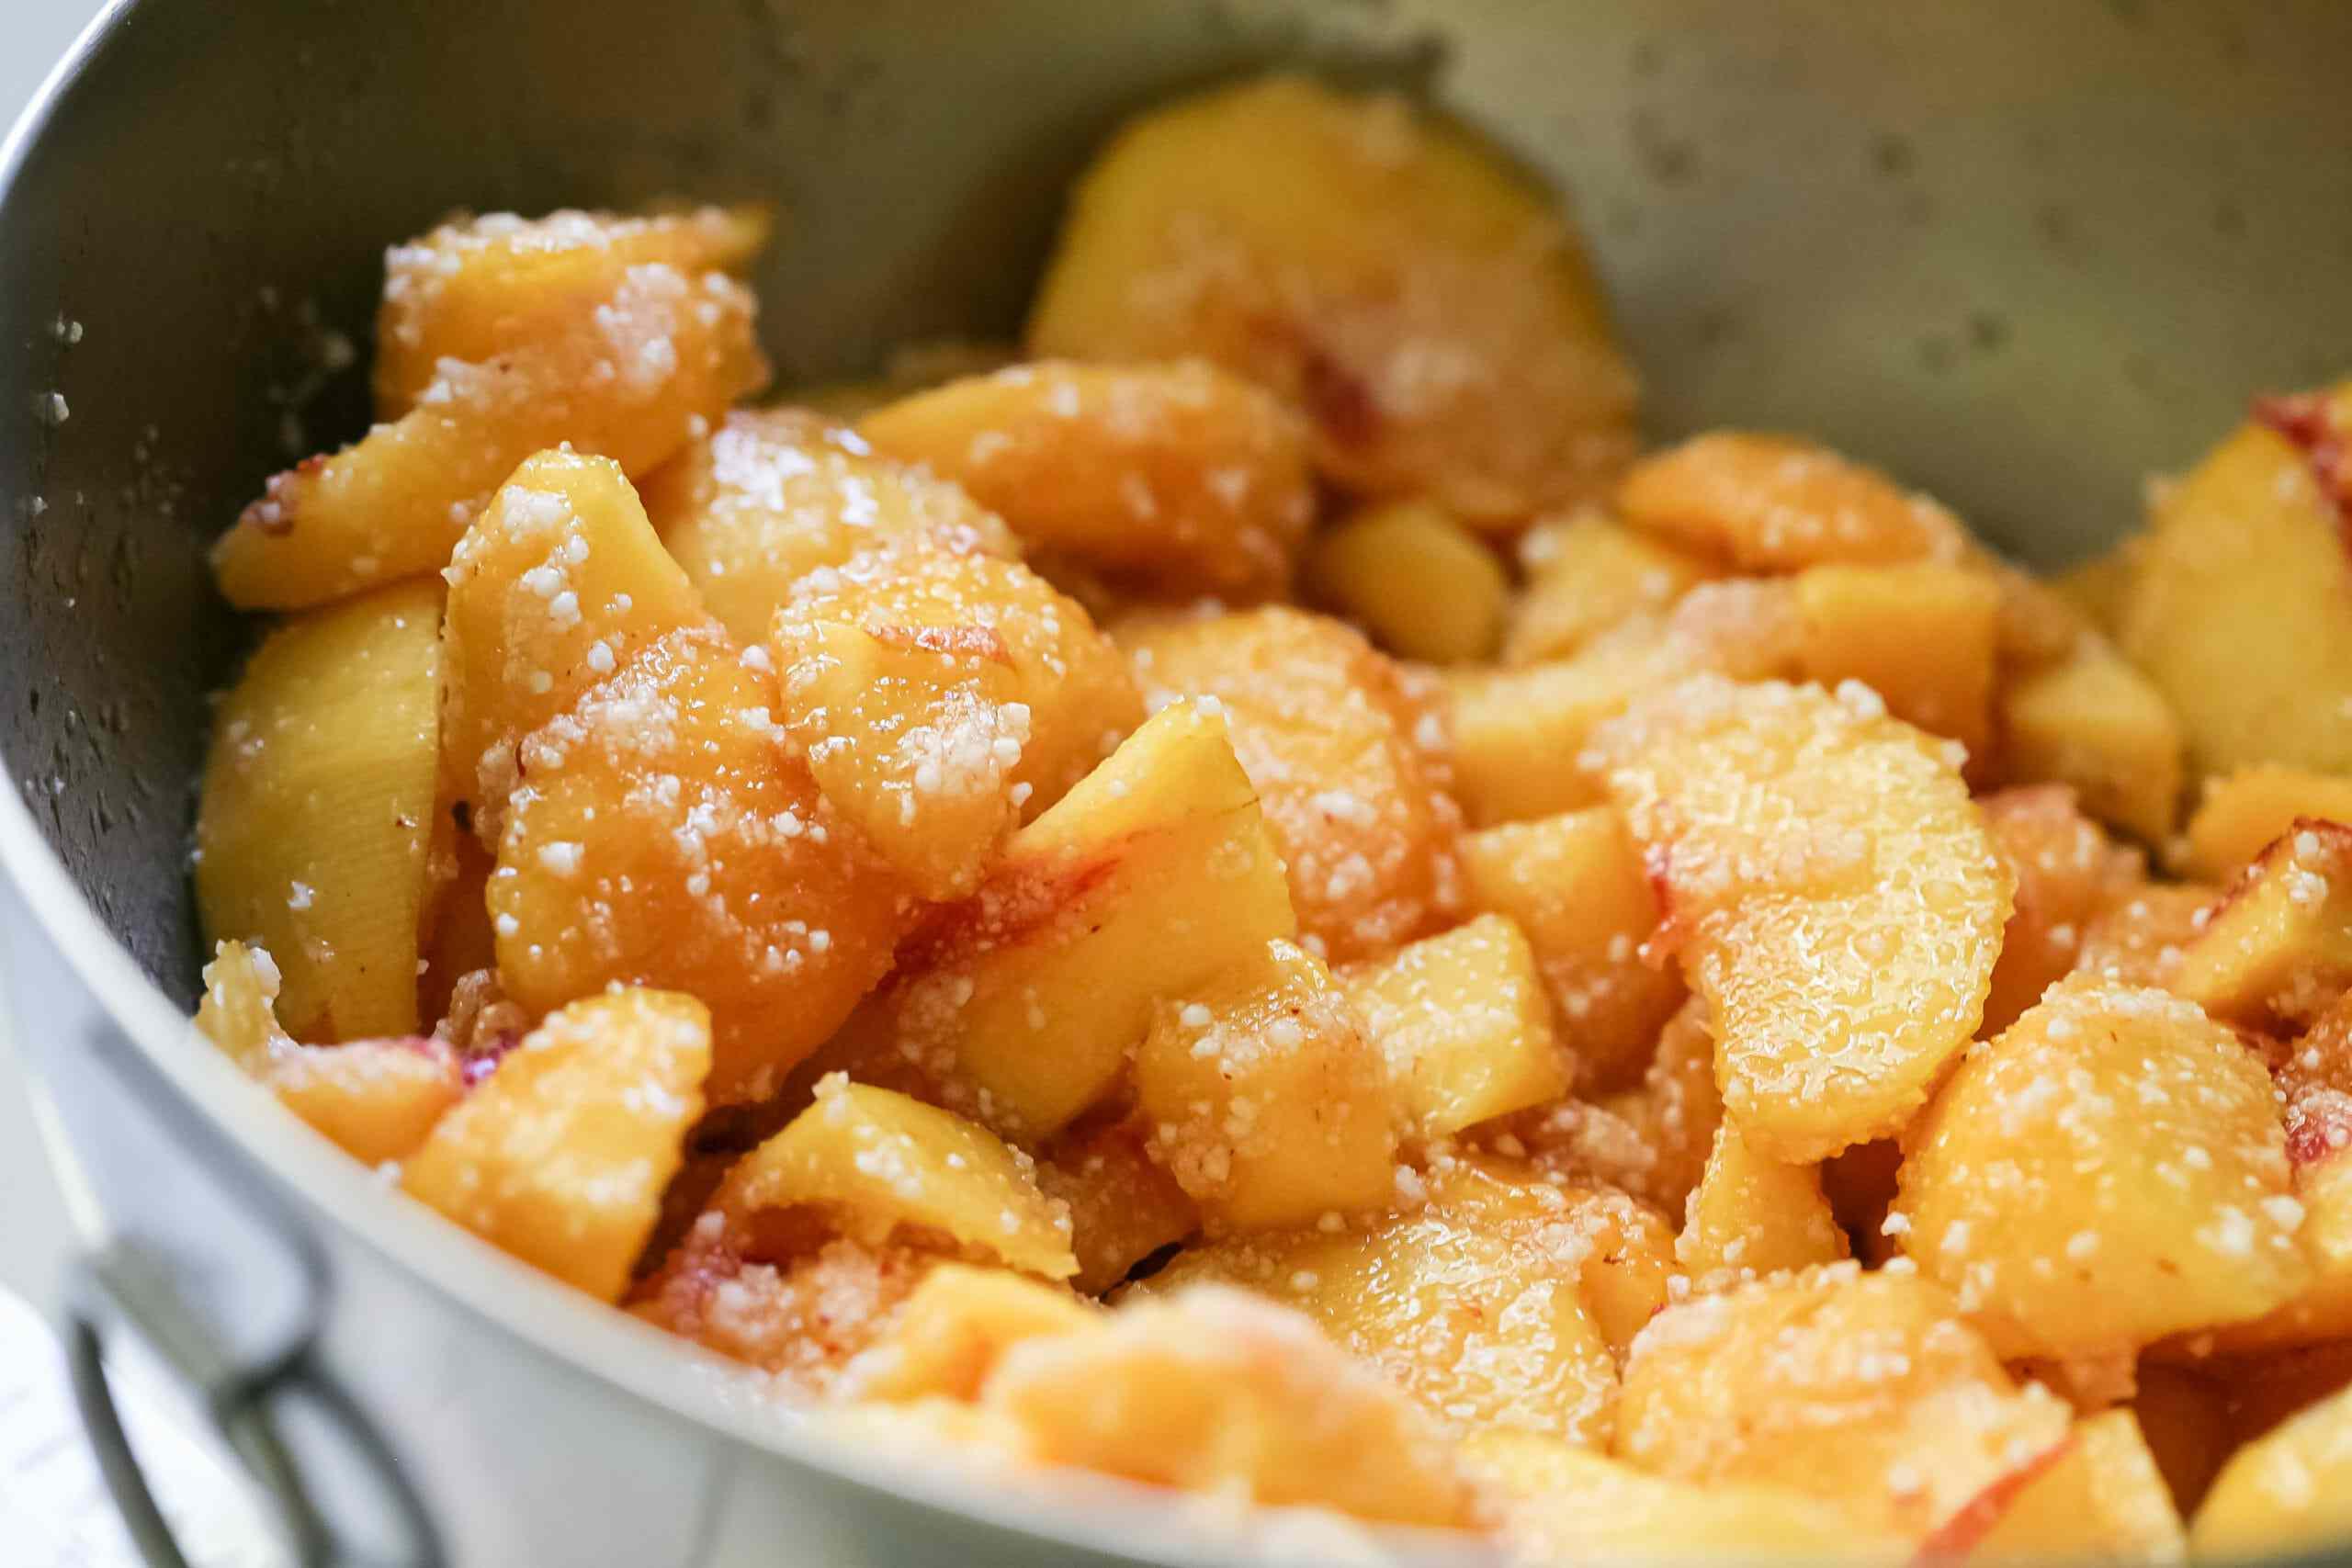 Macerated peaches for peach cobbler